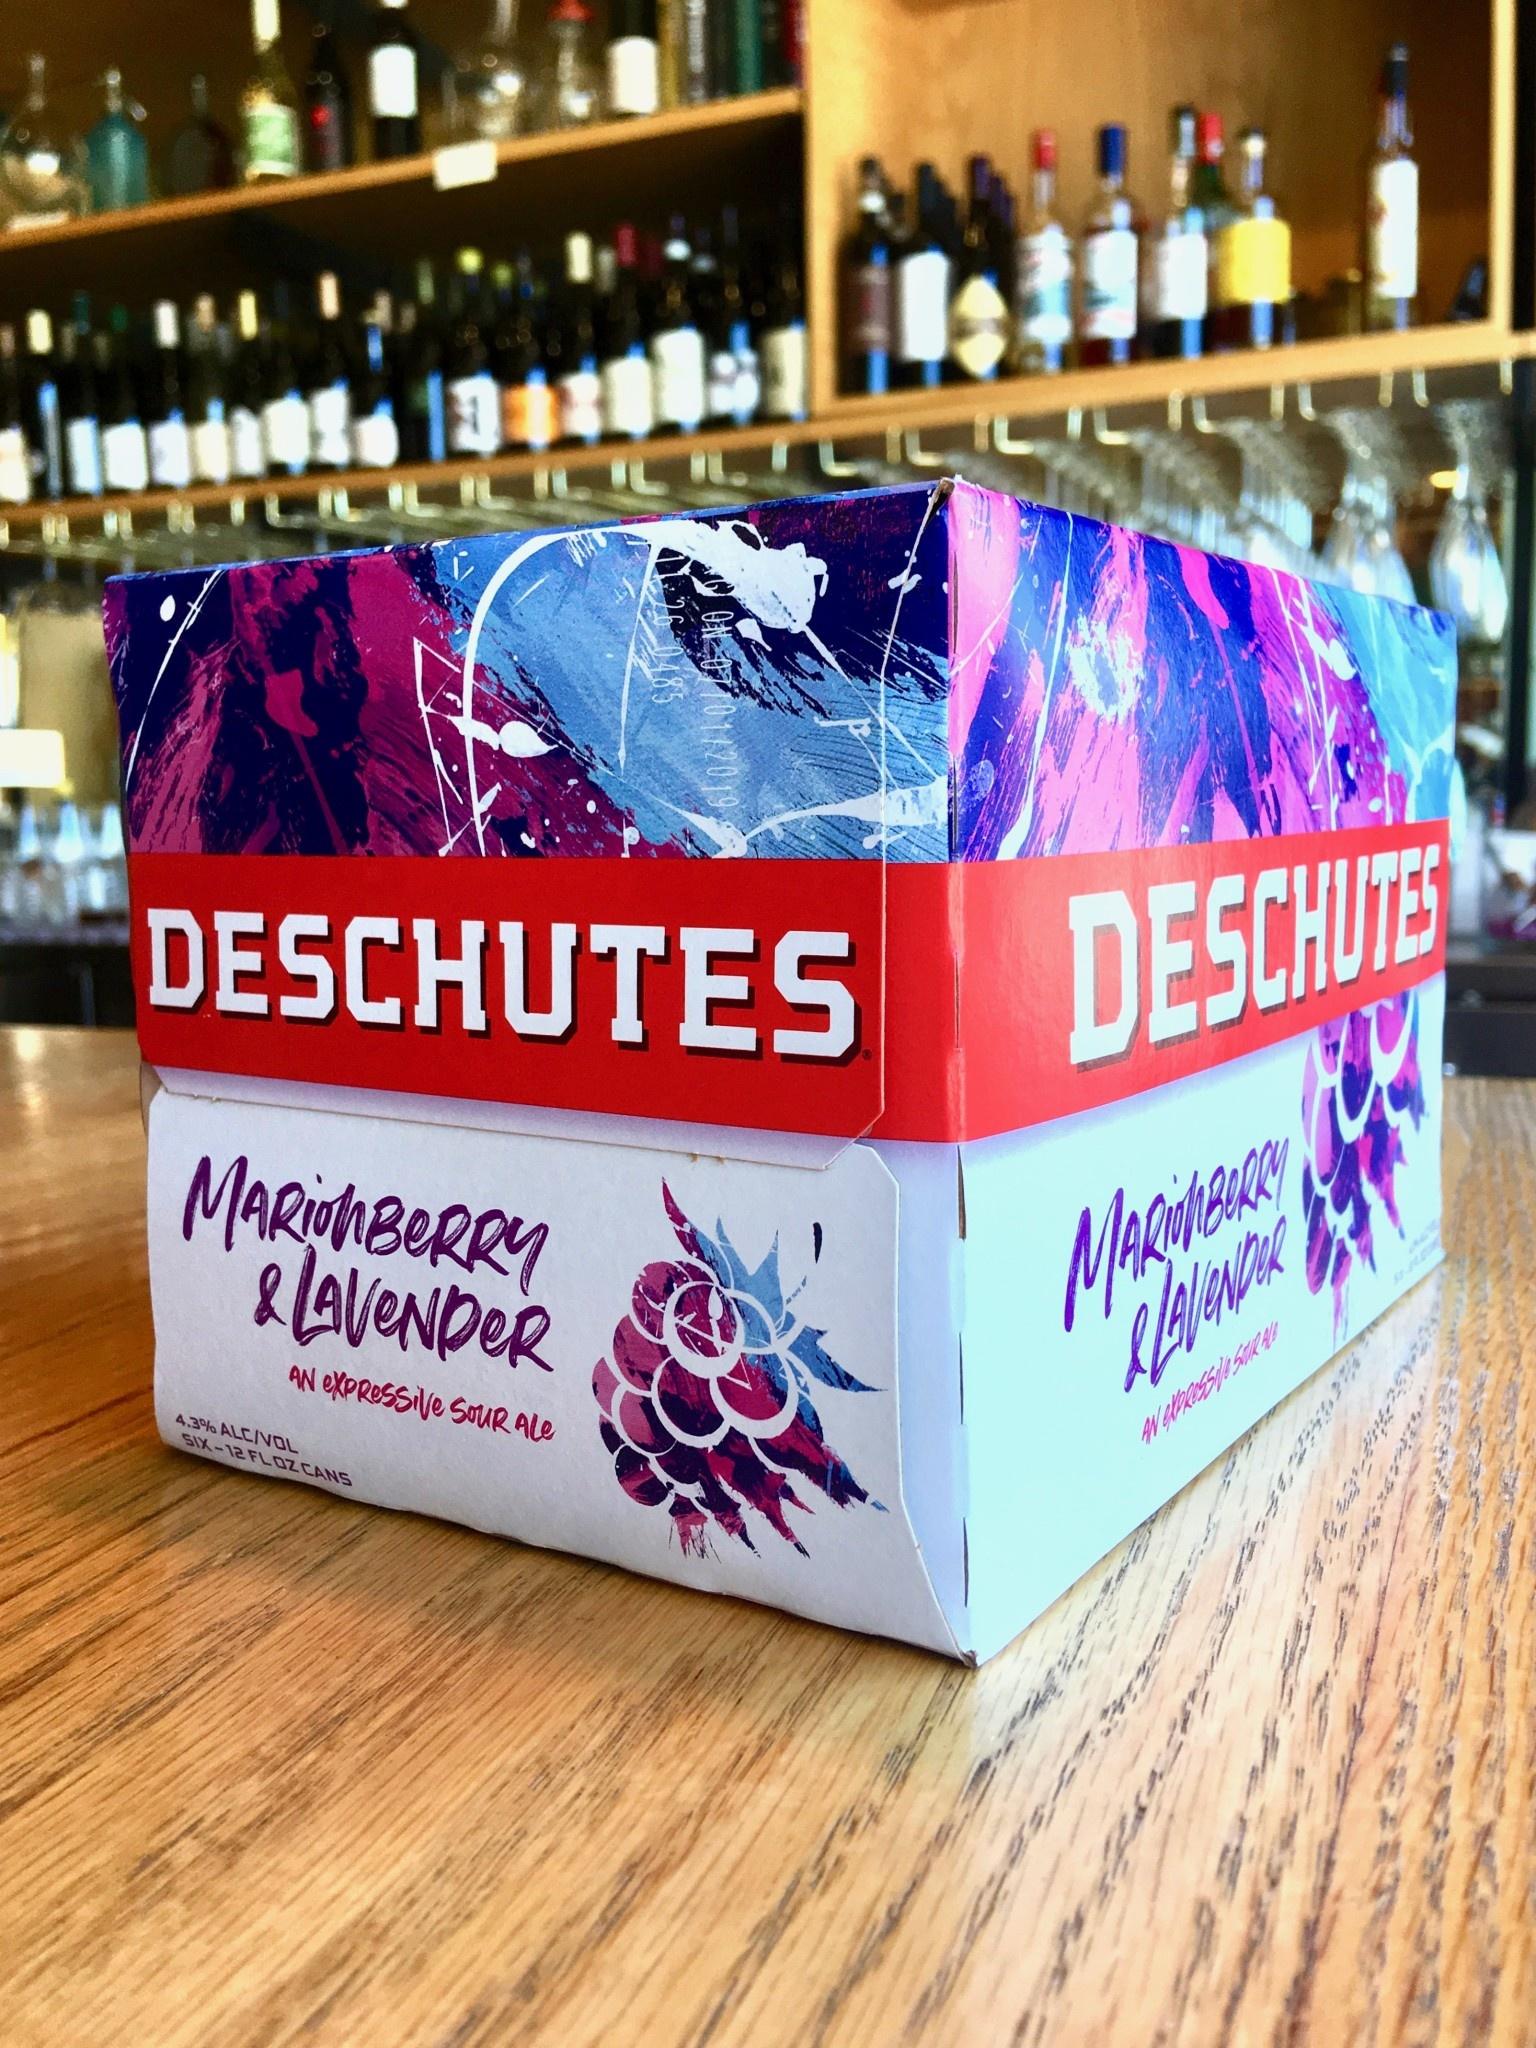 Deschutes Brewing Co. Deschutes Marionberry & Lavender Sour 12oz 6pk